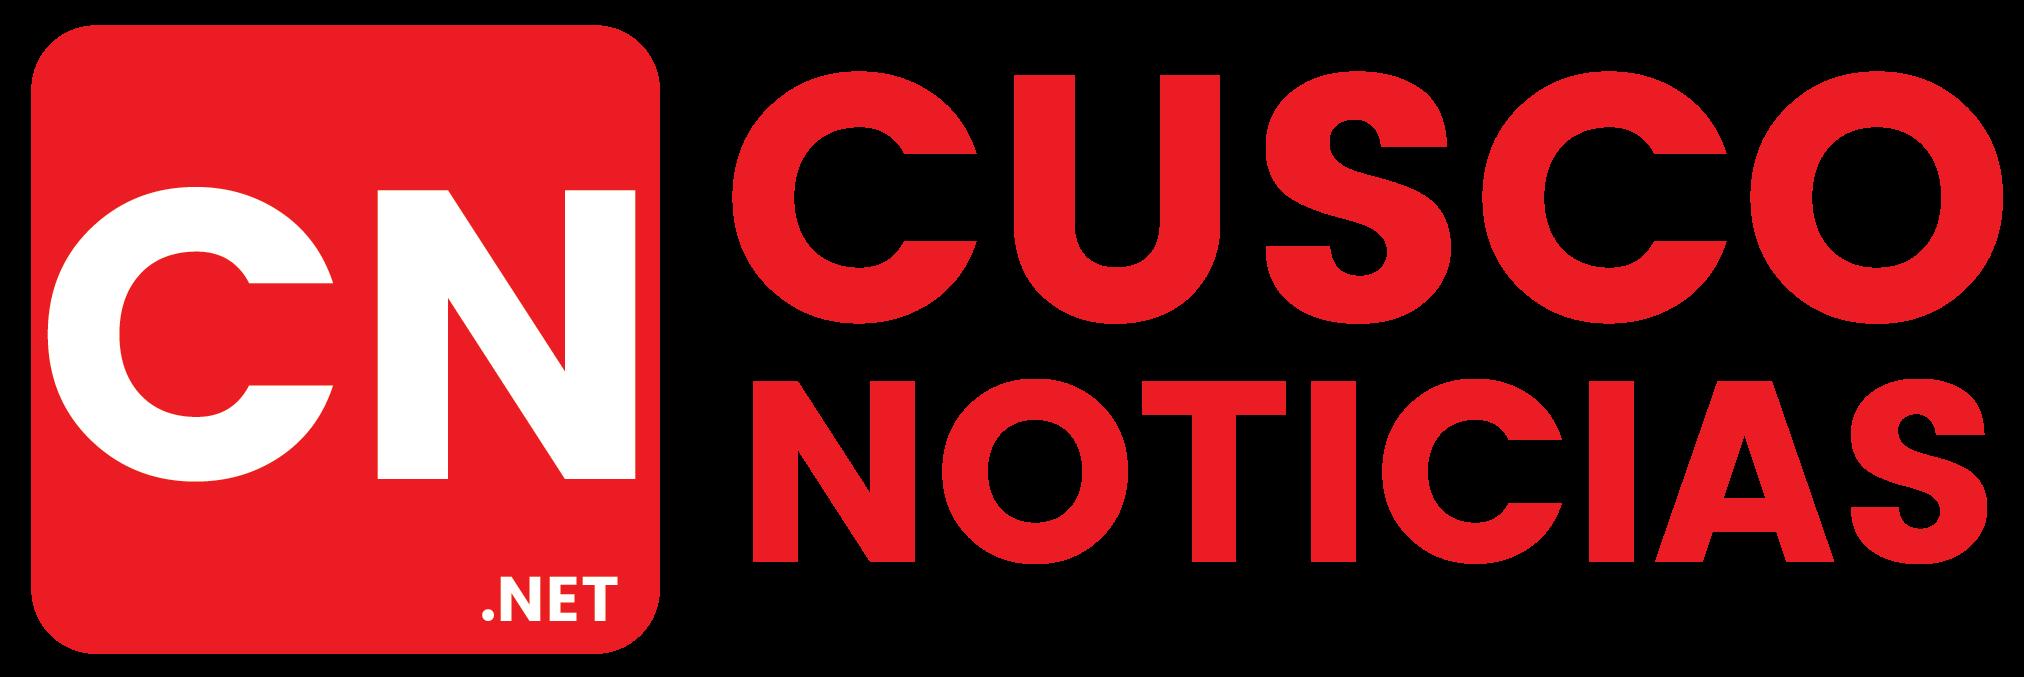 CW Cusco